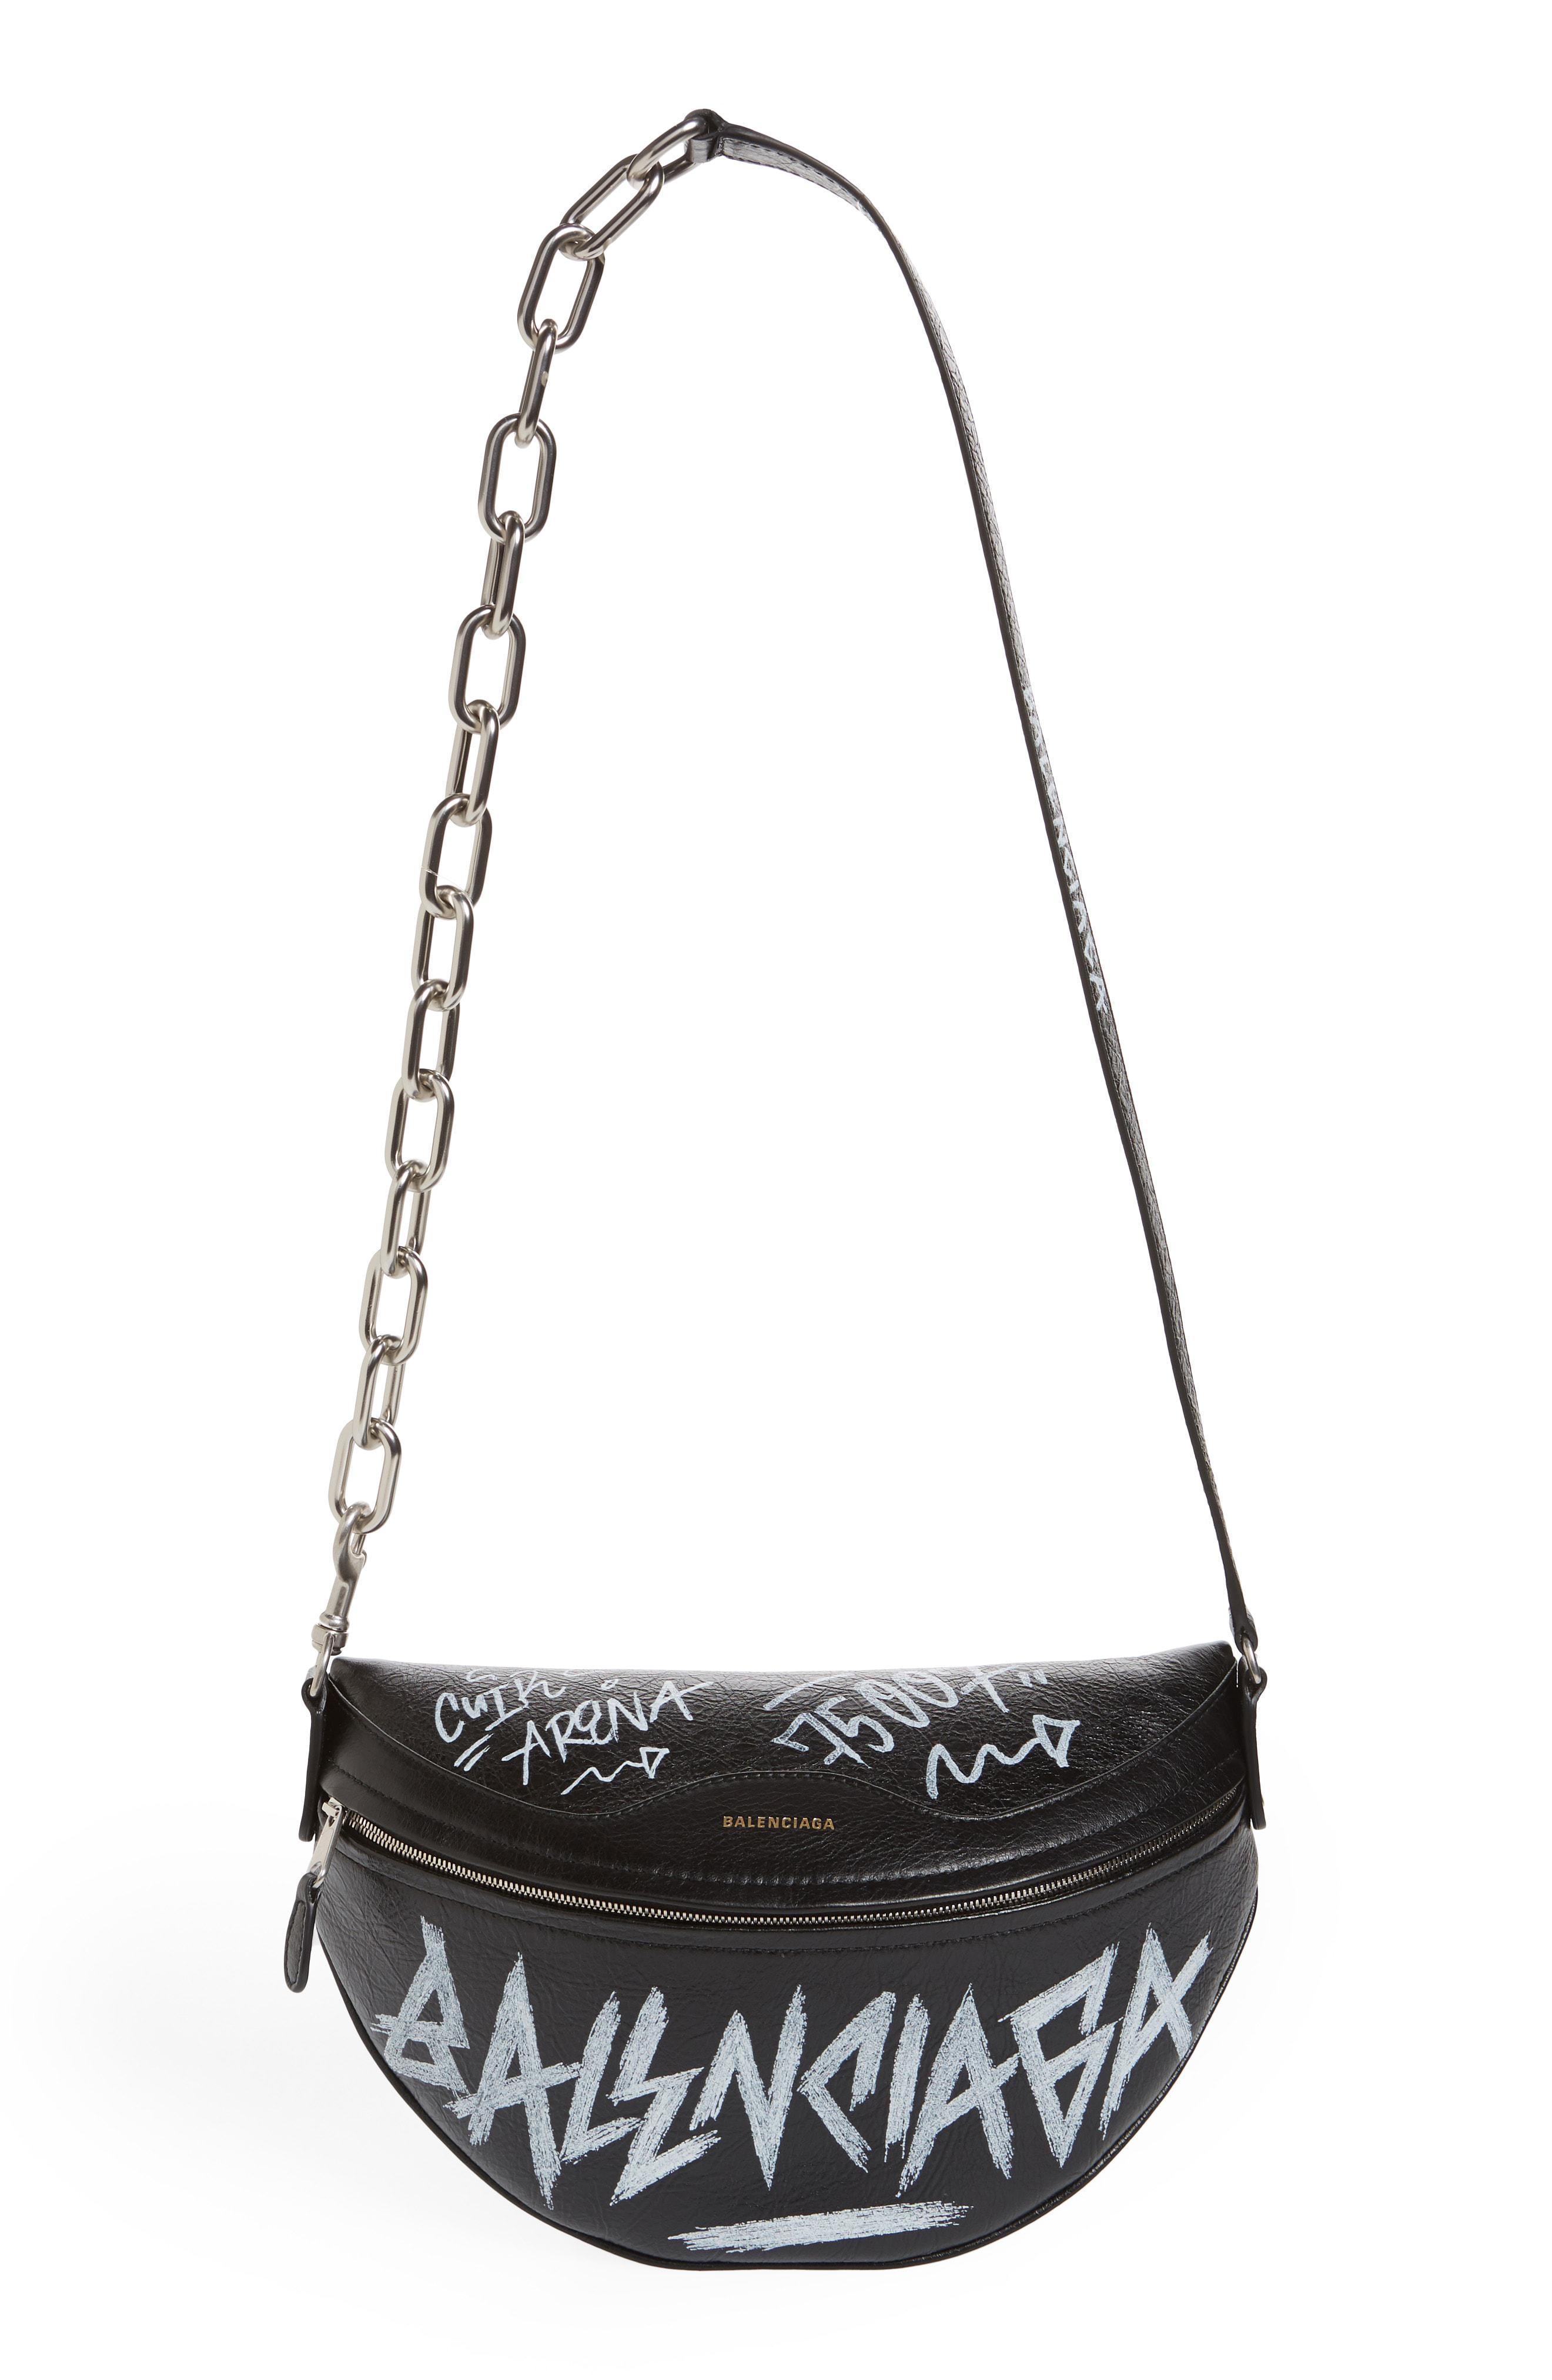 e4b1f814838e Lyst - Balenciaga Graffiti Souvenir Leather Belt Bag - in Black